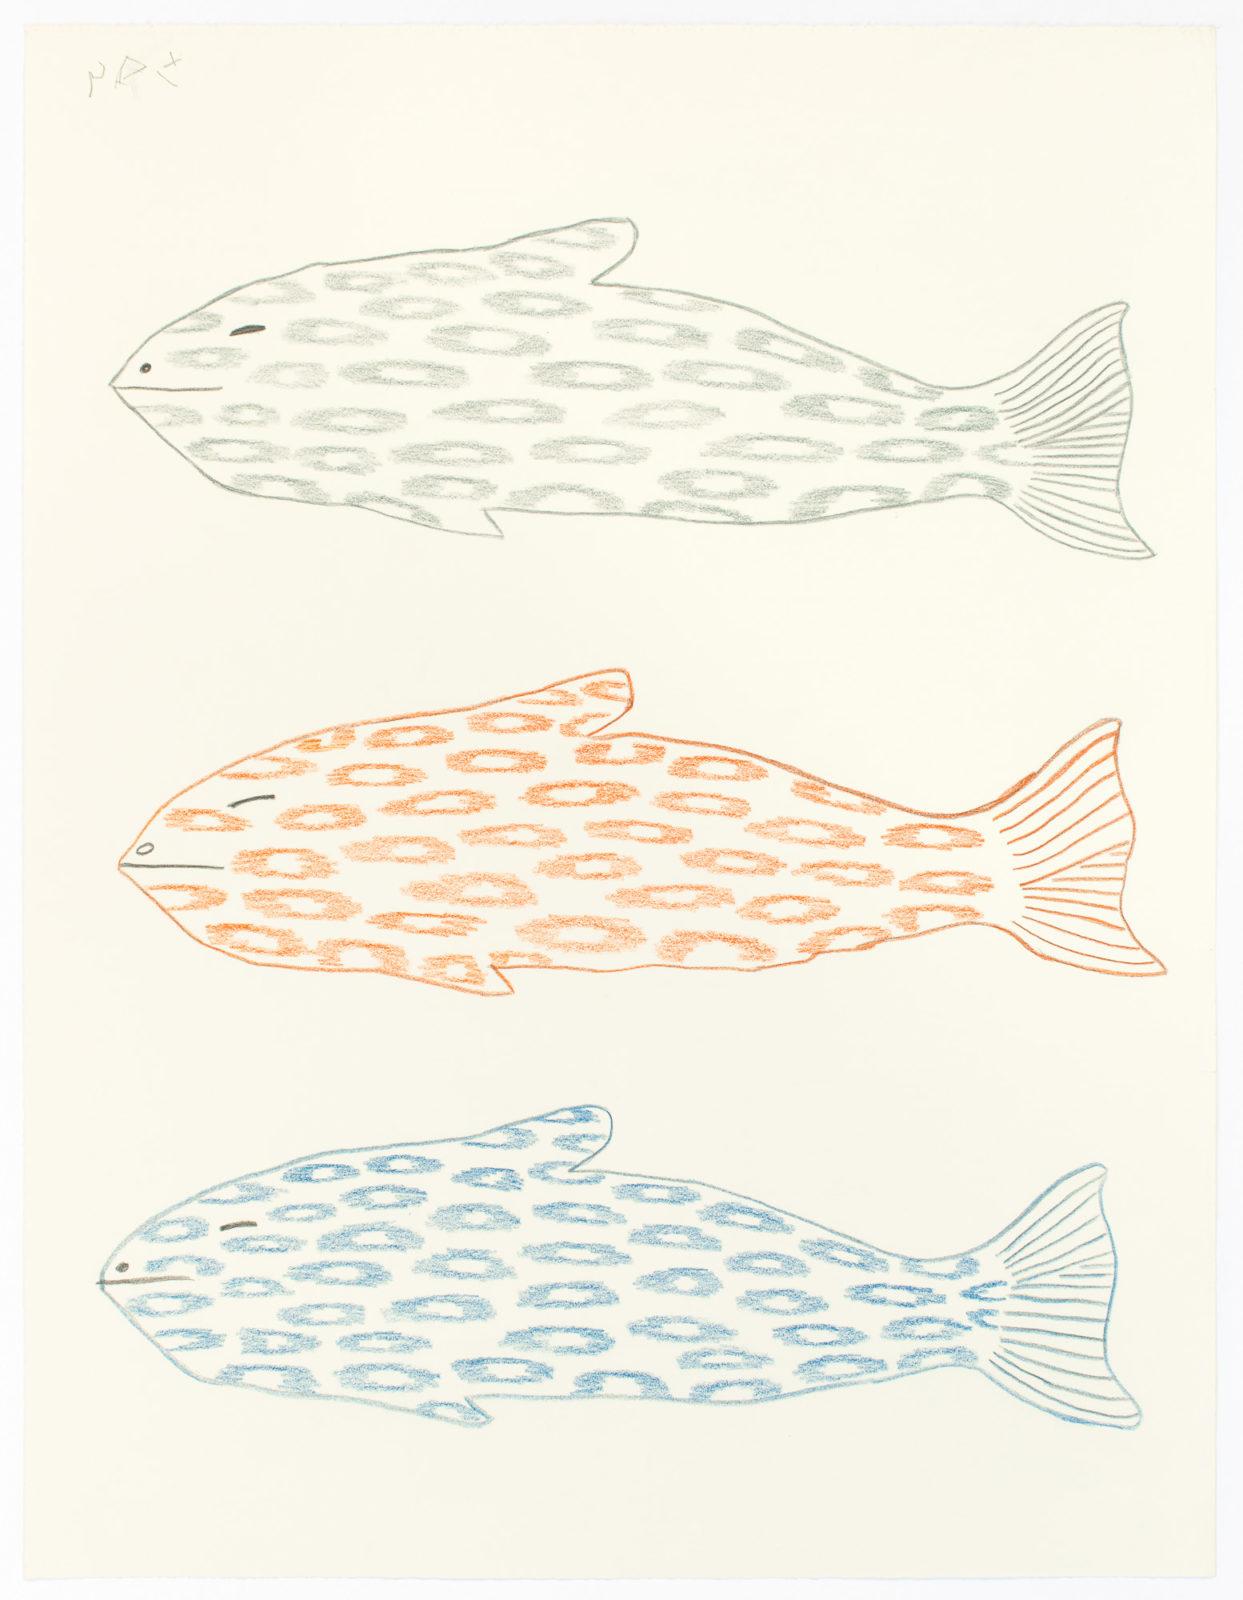 Sheojuk Etidlooie - untitled (three fish)